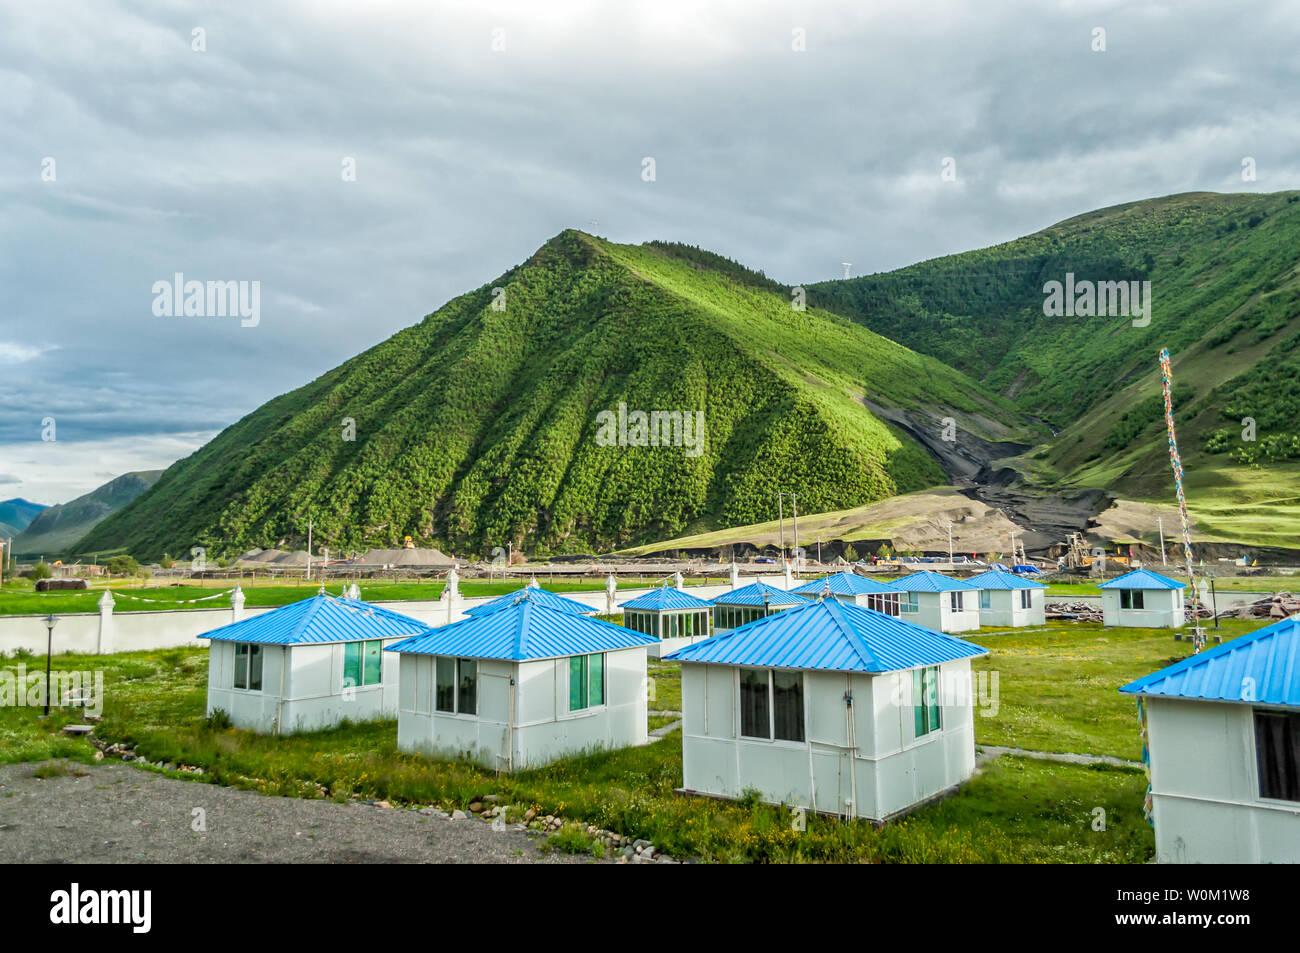 Natural Scenery of Xindu Bridge Tibetan Area in Tagong, Sichuan Stock Photo